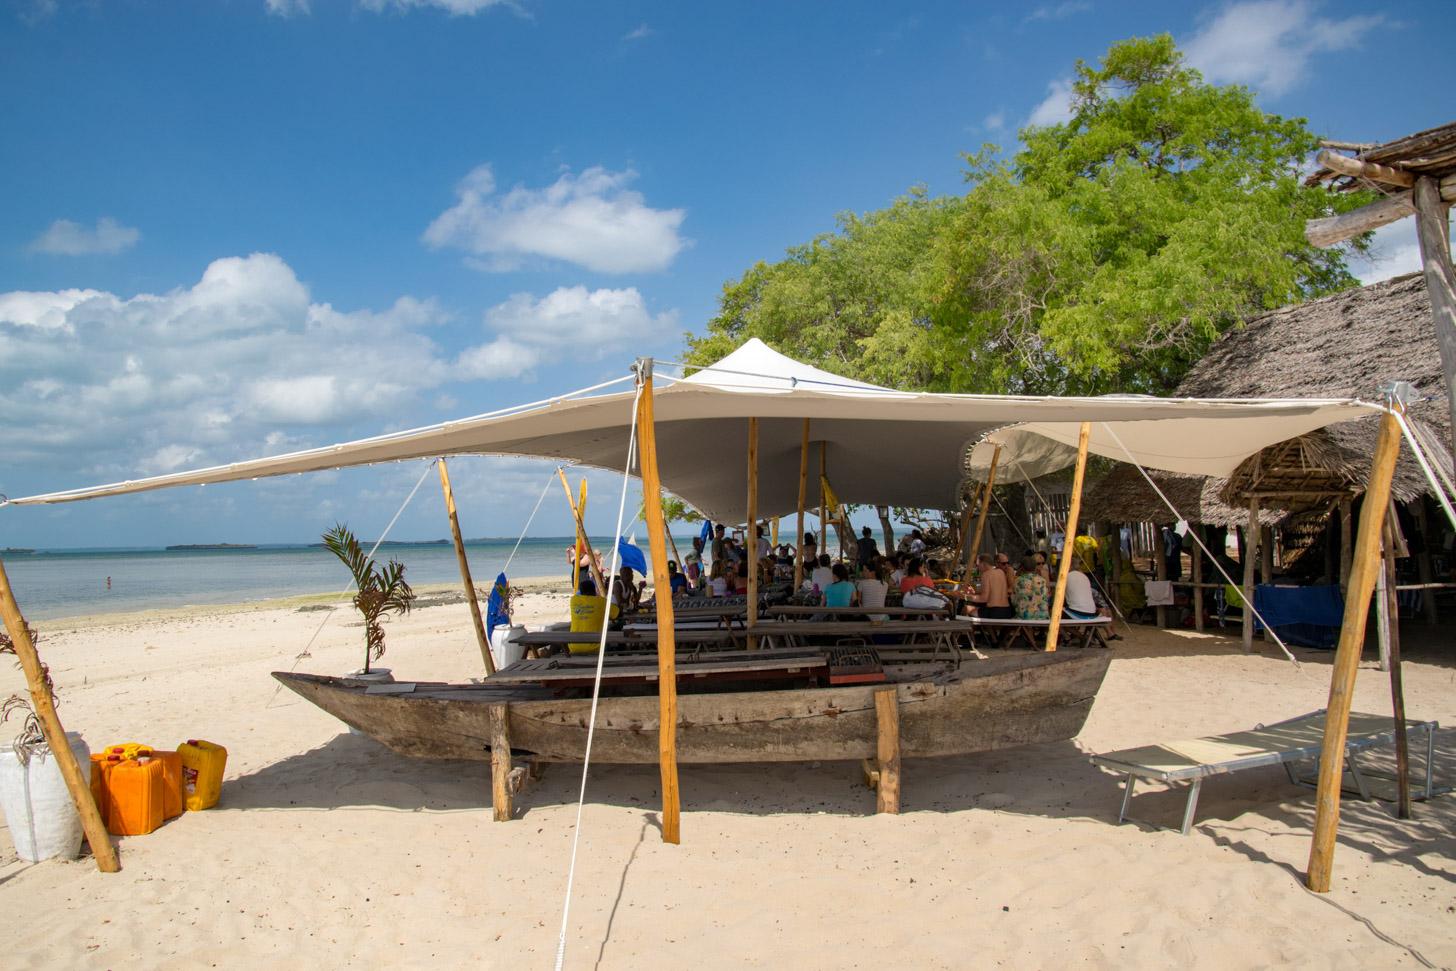 Wit zandstrand op Zanzibar